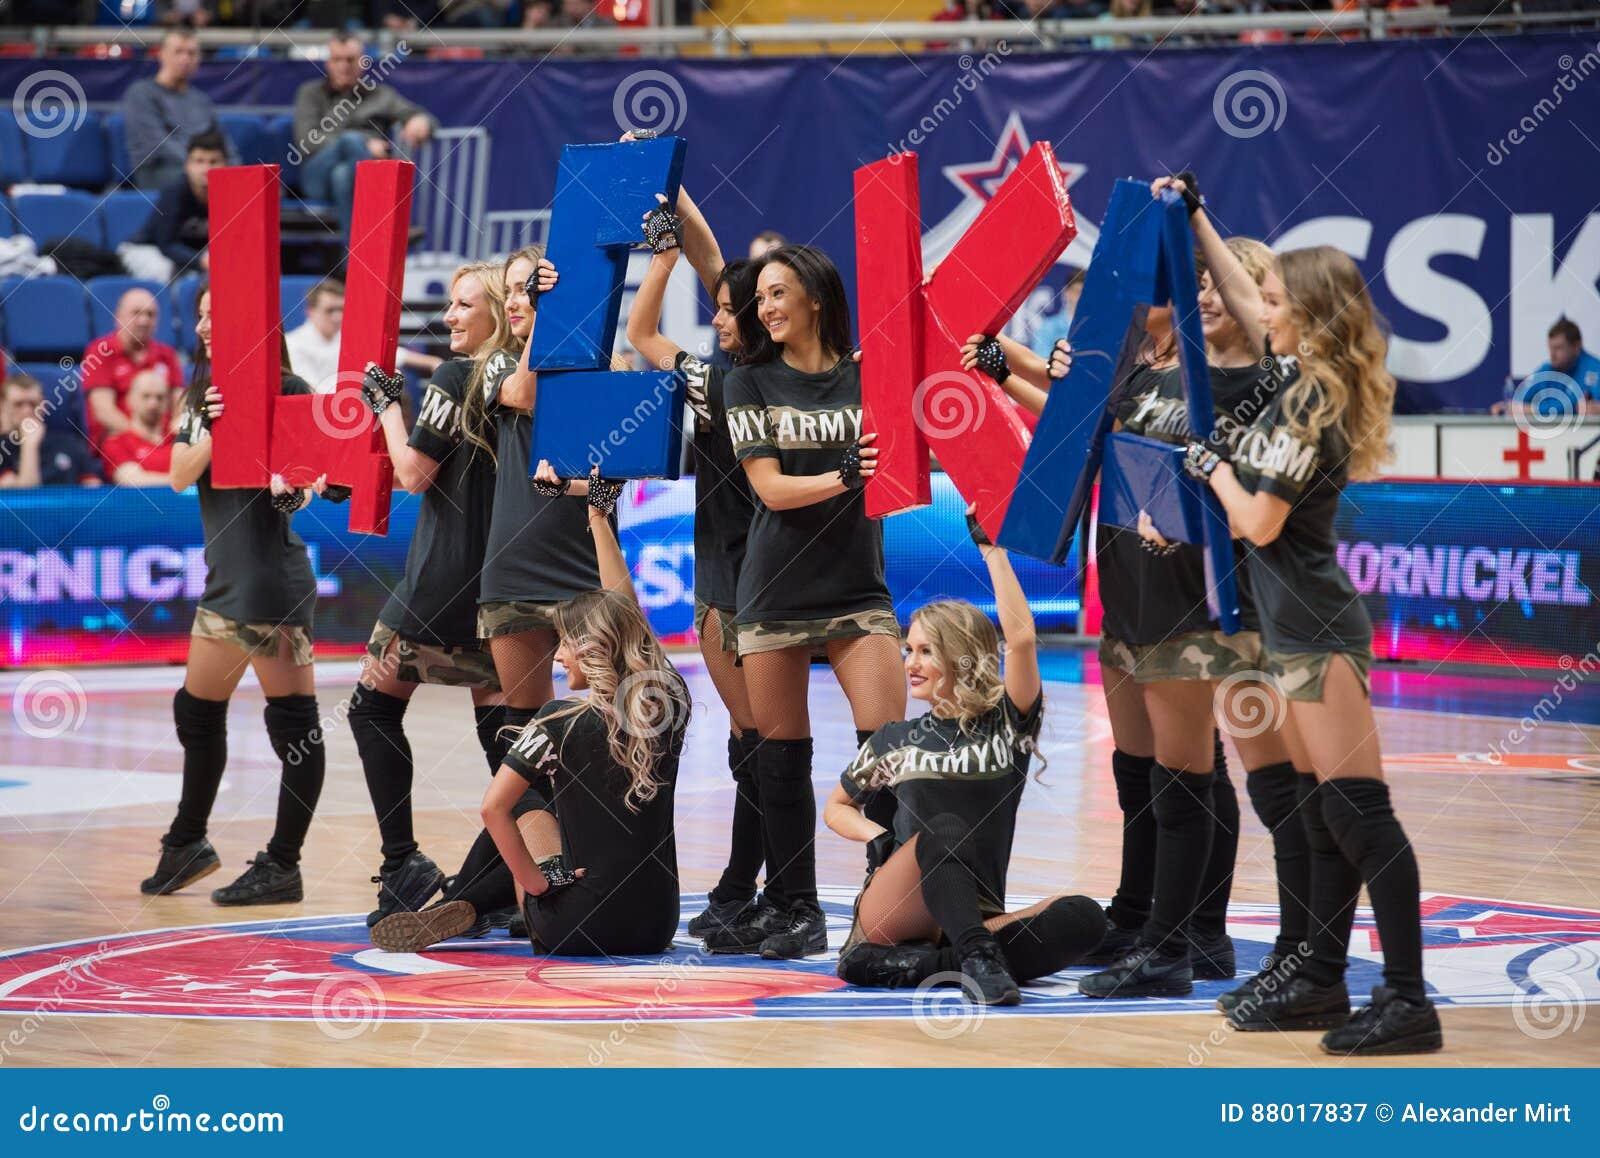 Cheerleaders chwyta CSKA znak